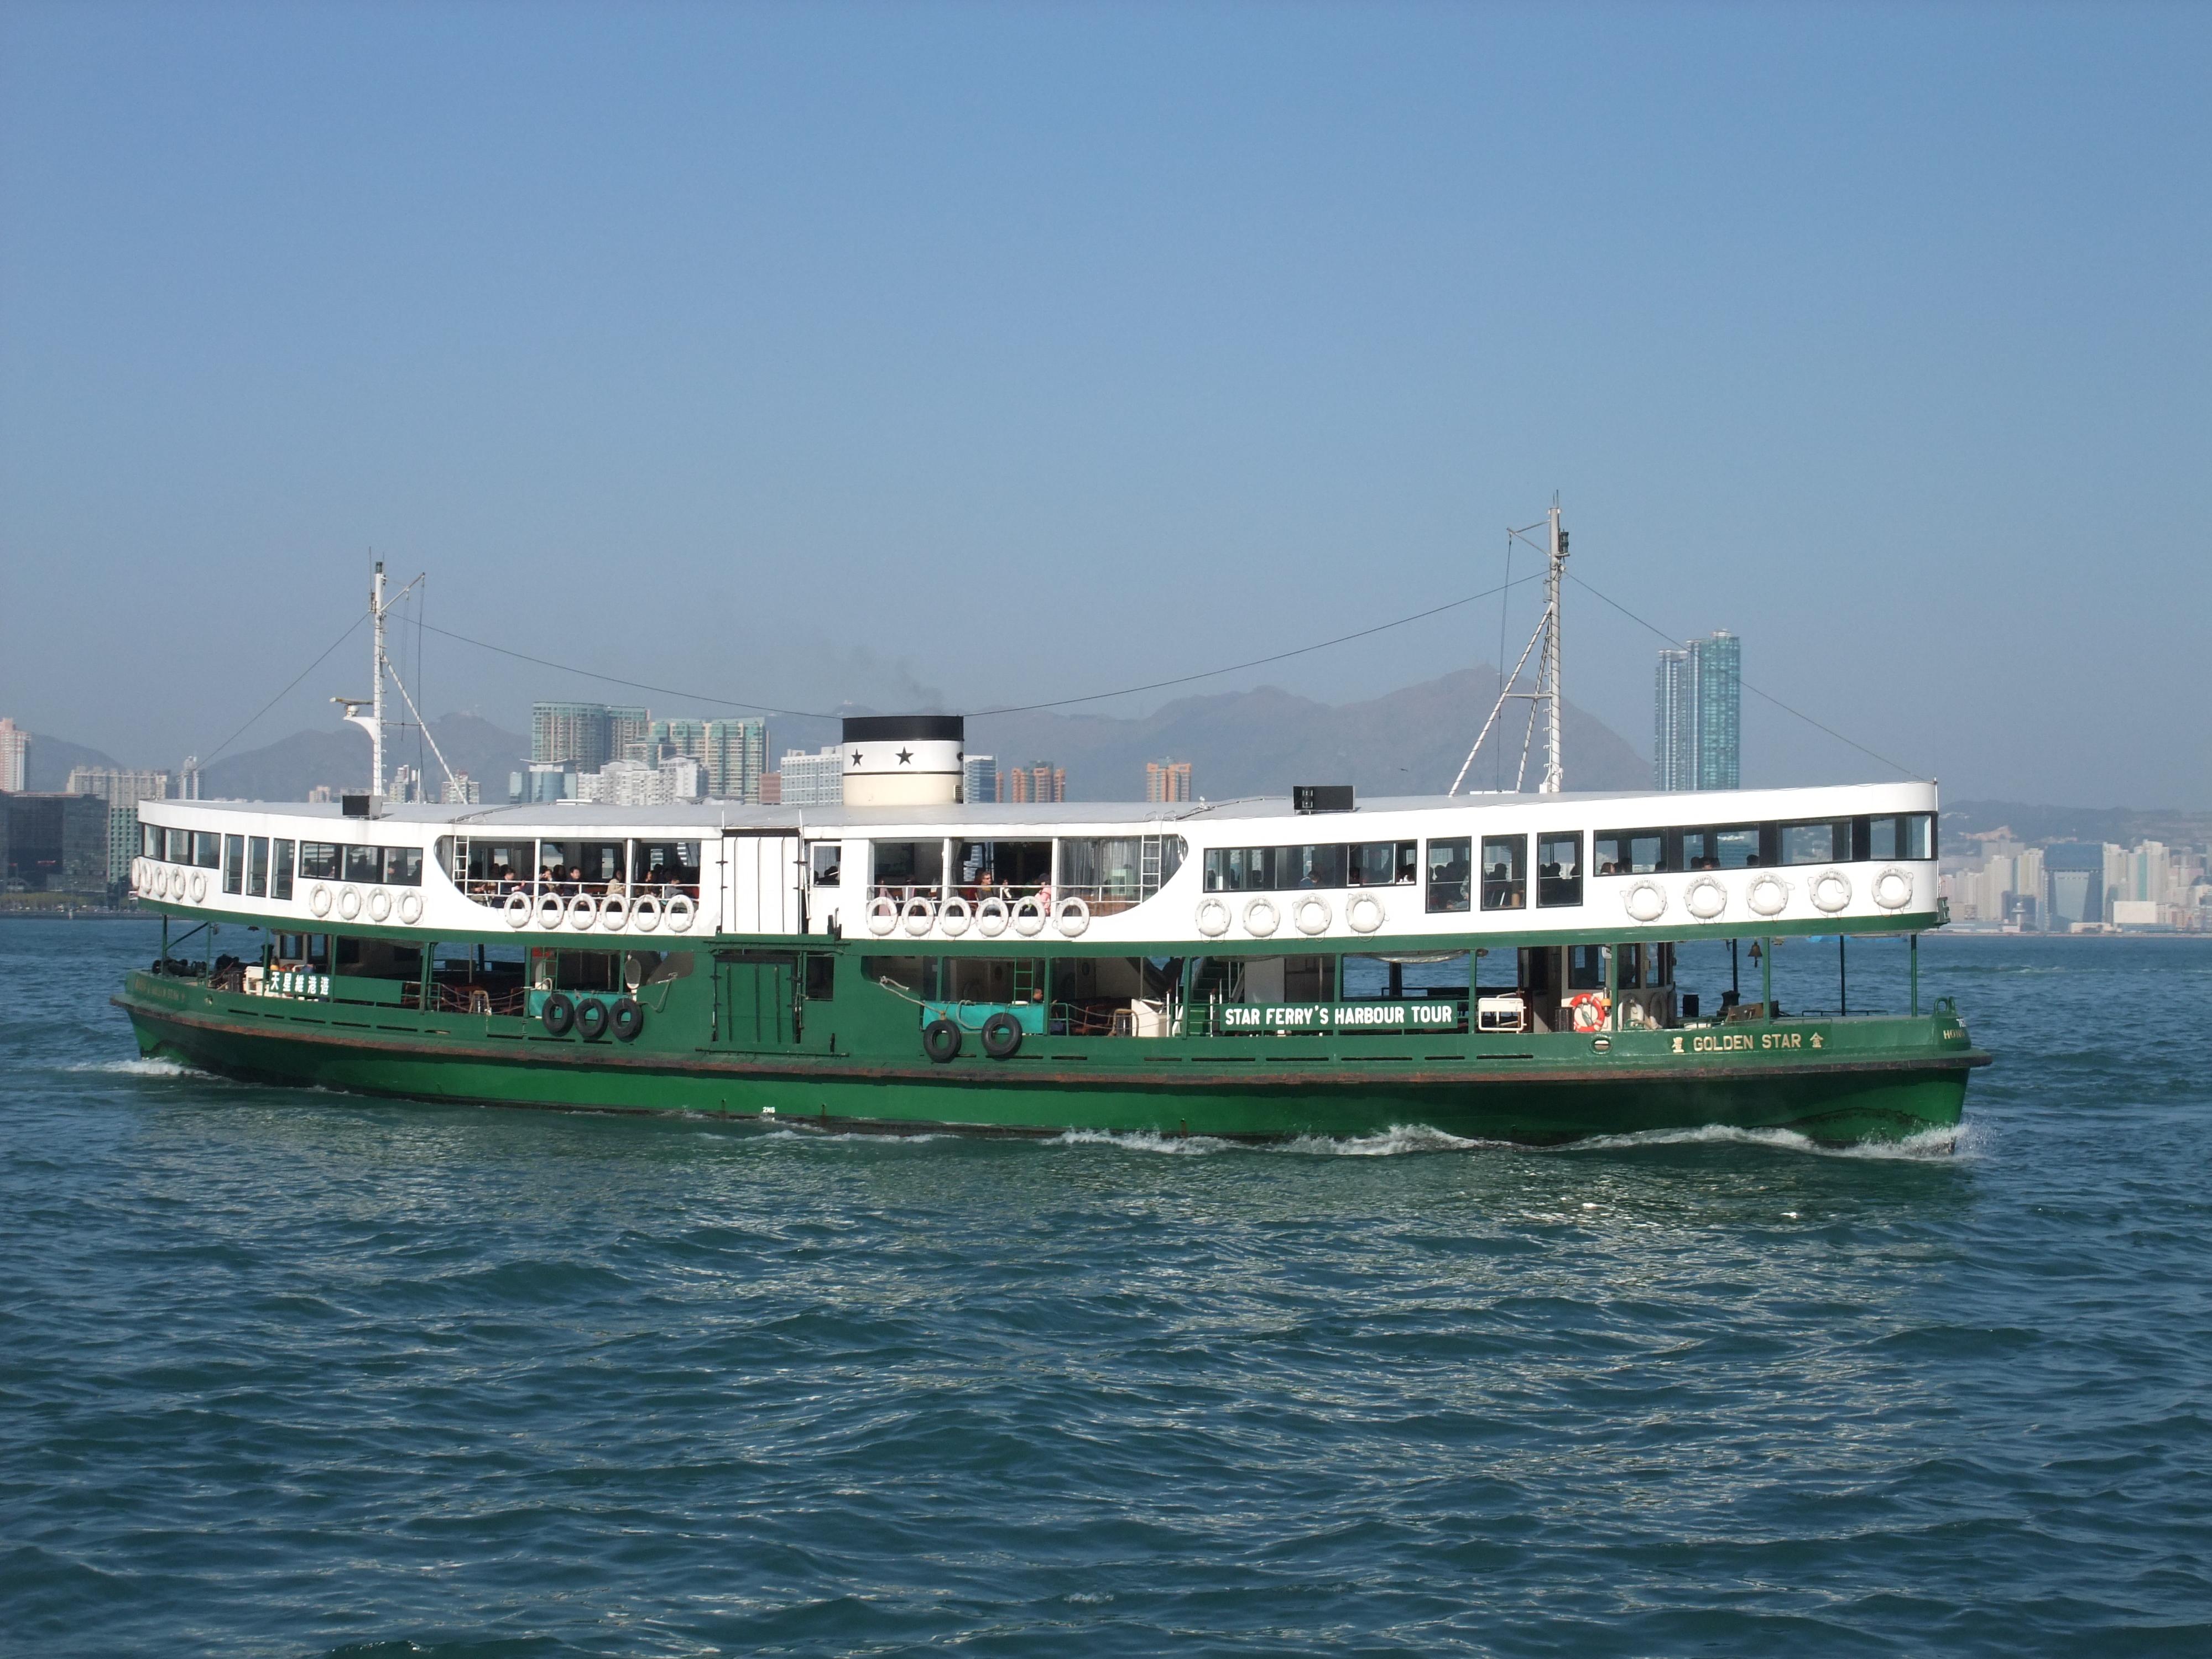 Boat Ferry From Jekll Island Tost Simonsisland